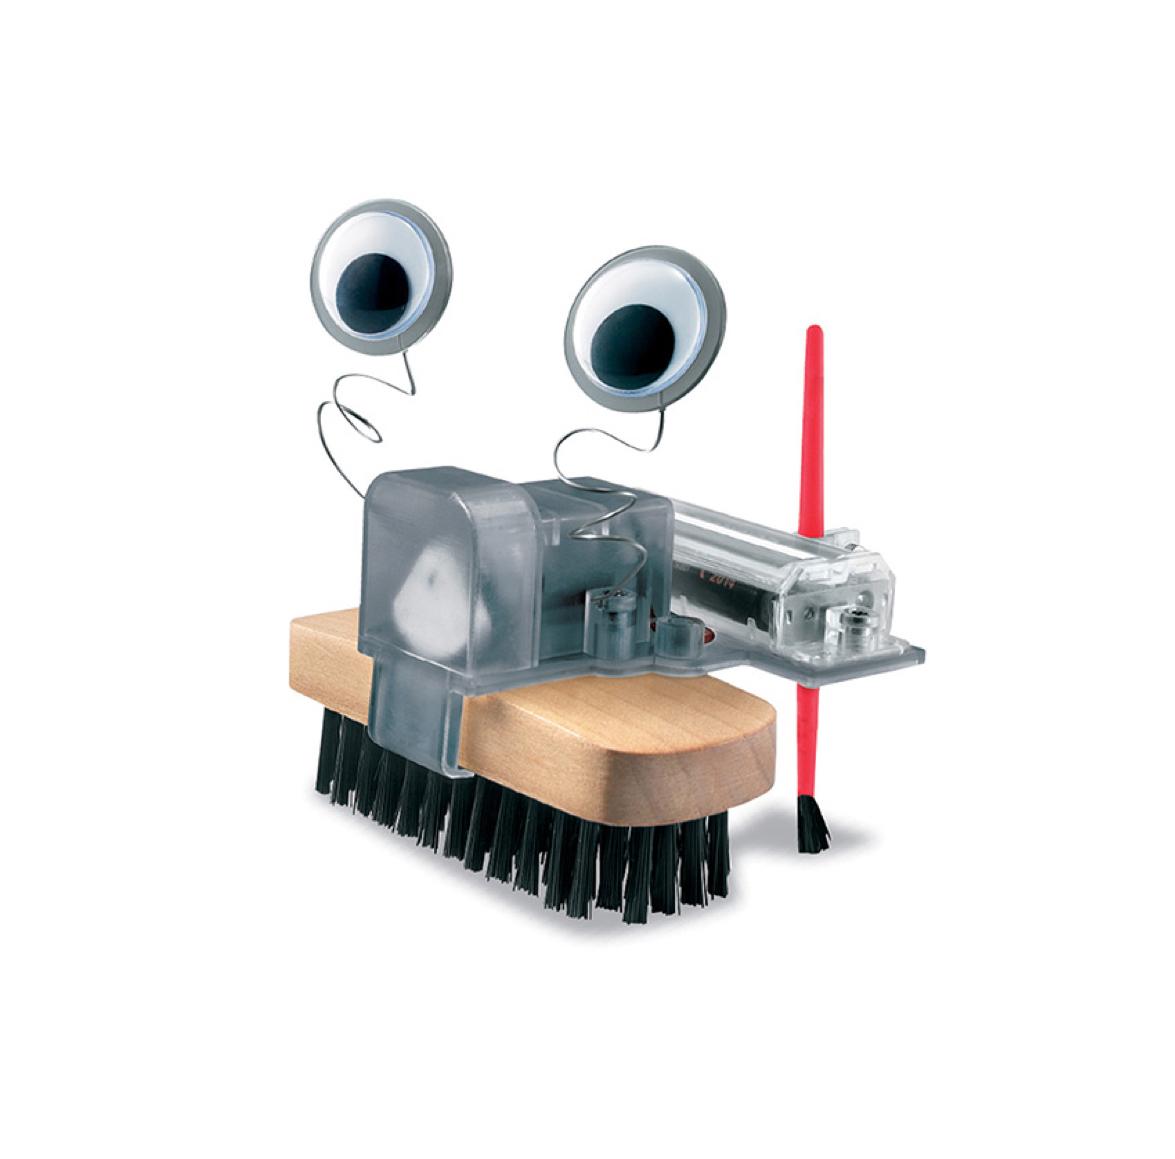 cepillo-robot-brush-robot-de-4m-en-el-mundo-de-mico-2